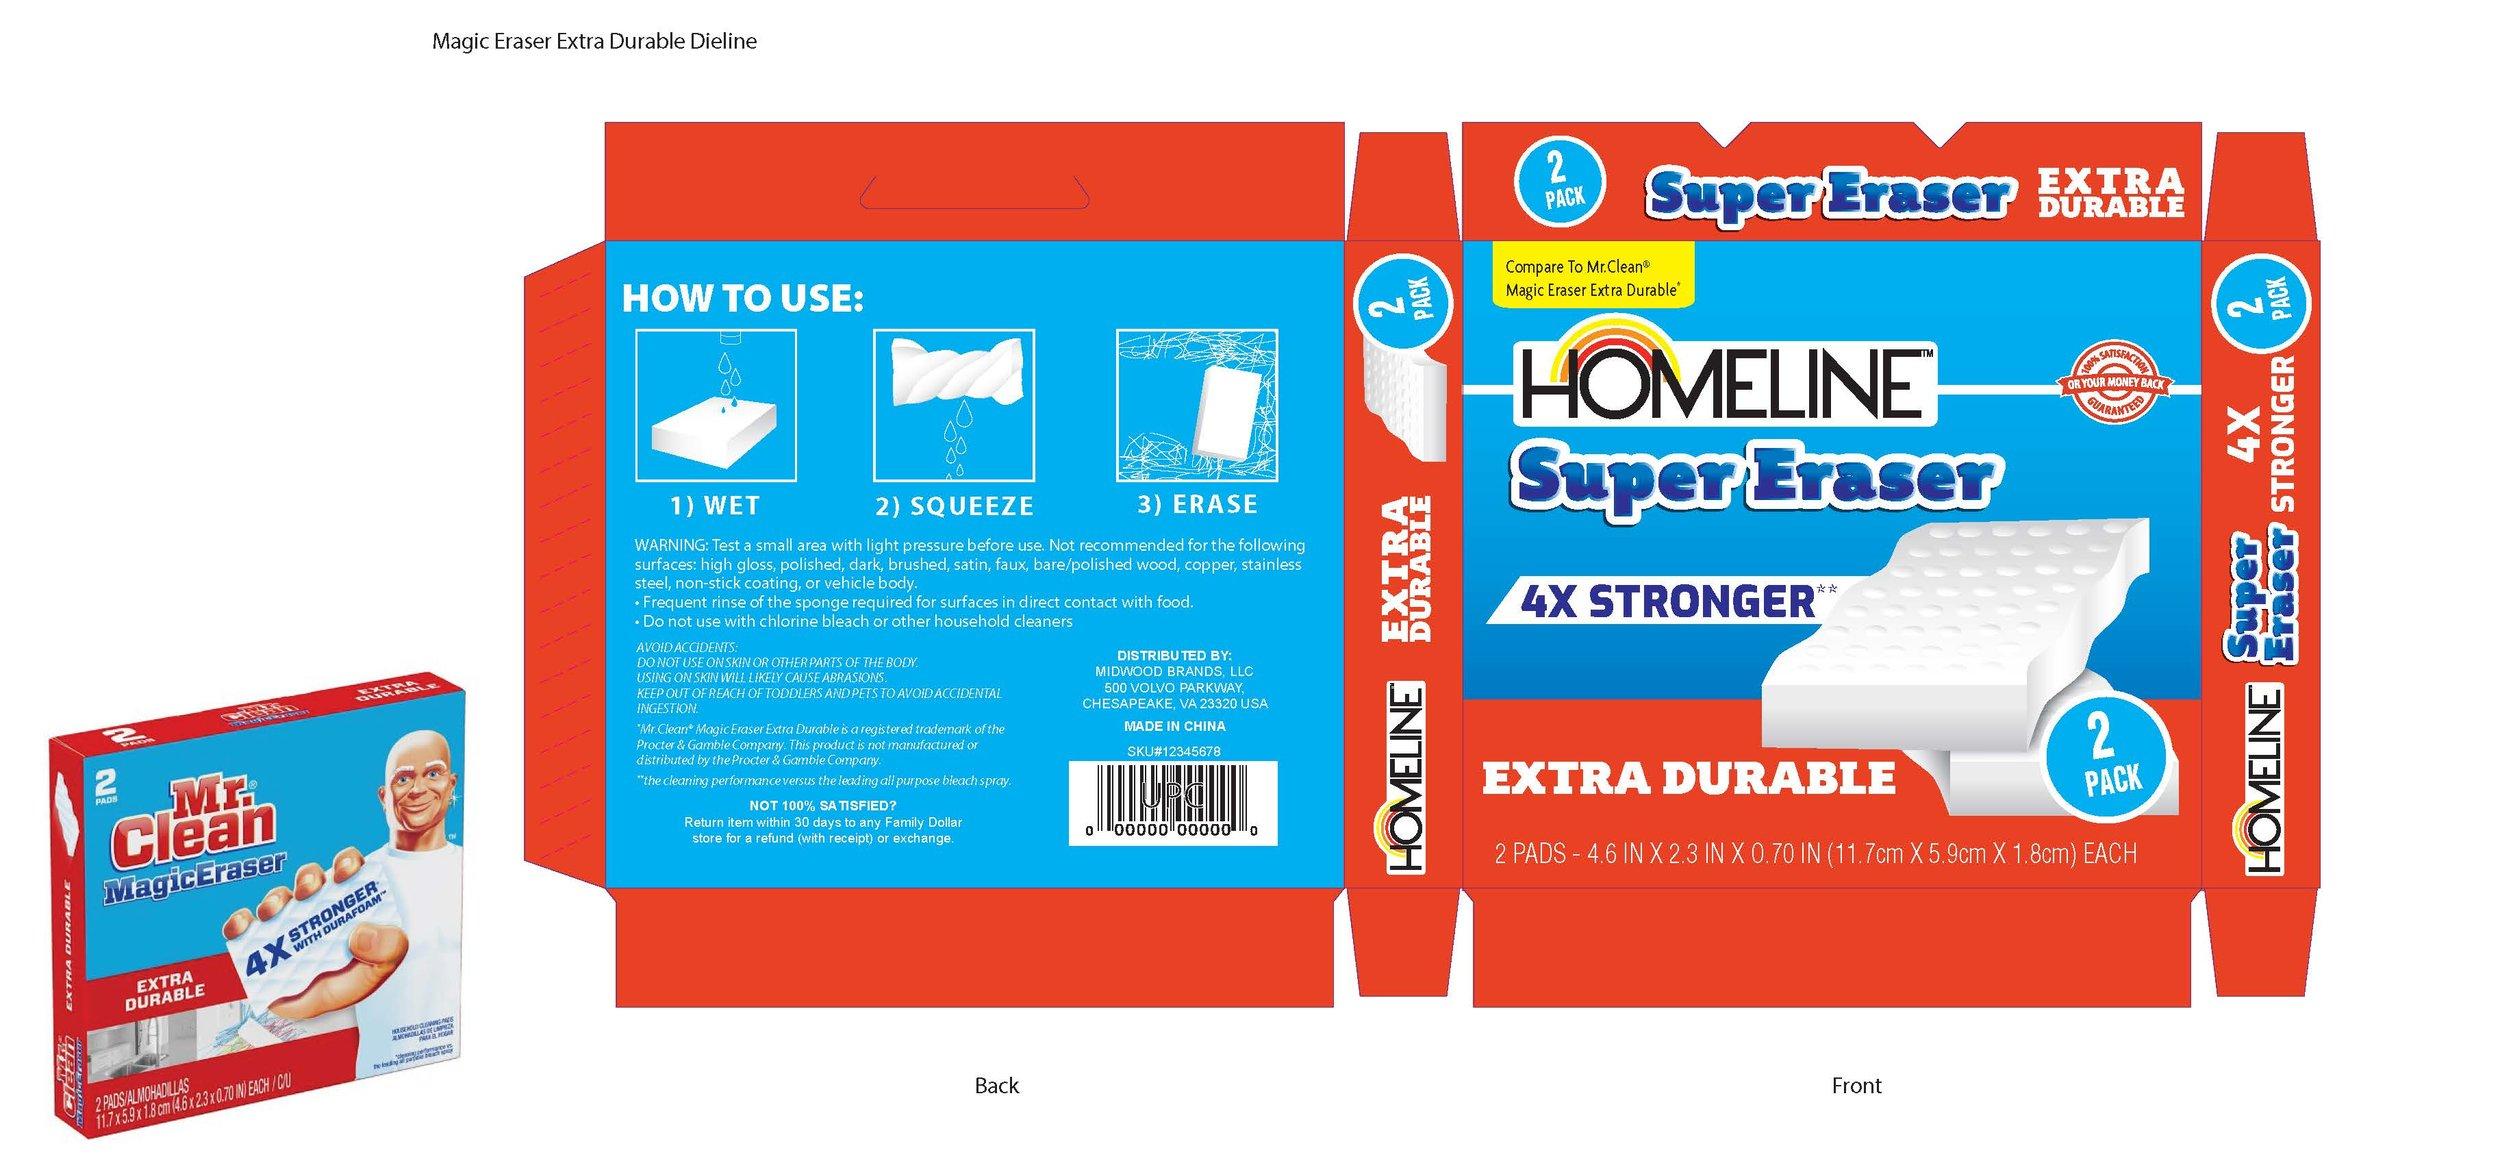 PB_Magic Eraser Extra Durable Dieline_SSI_HOMELINE.jpg